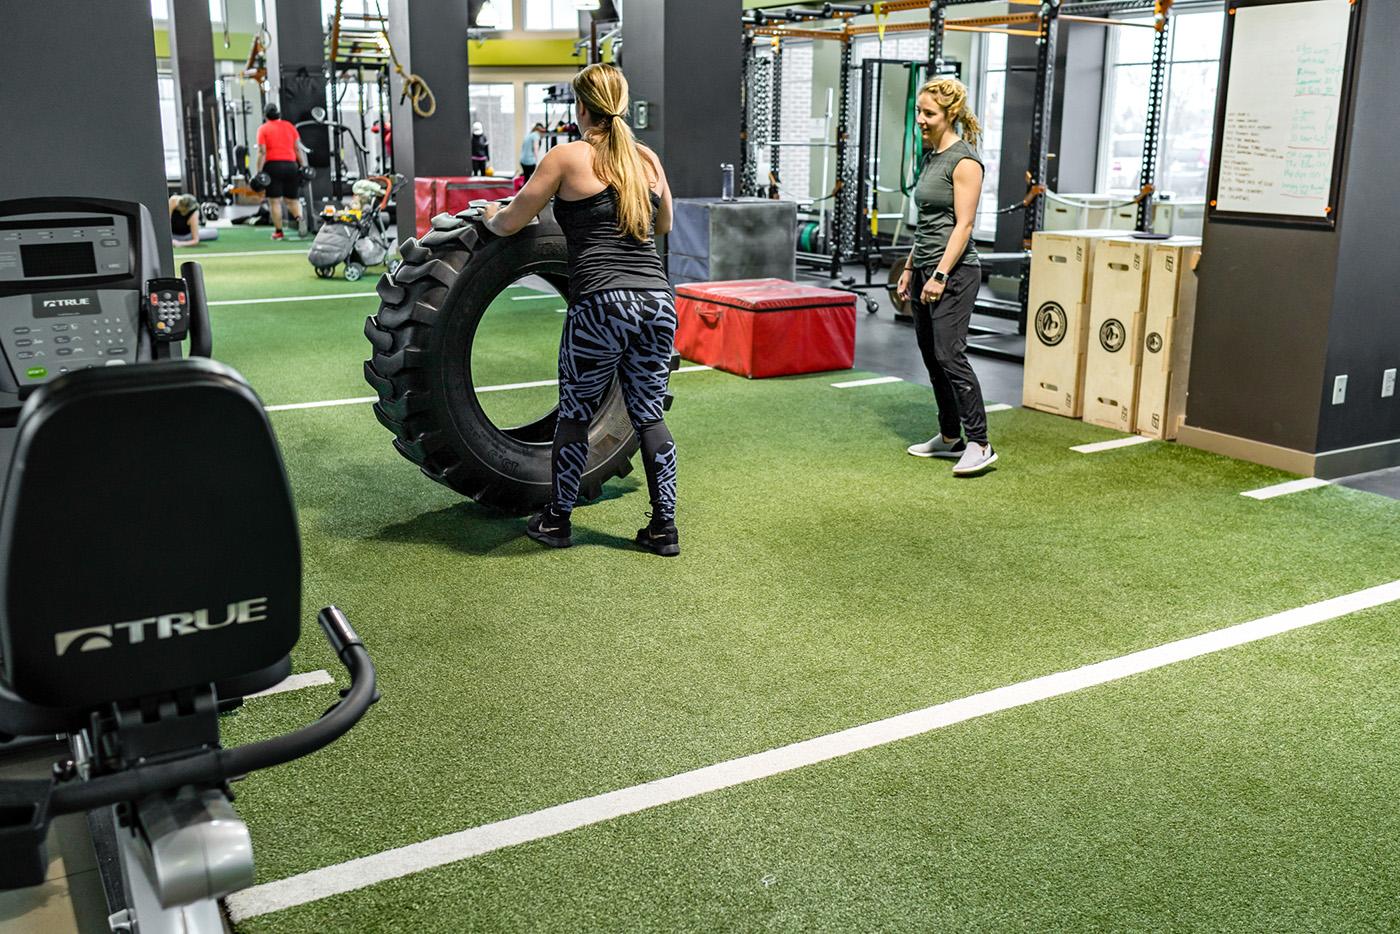 cityfit-gym-personal-training-calgary-workout-facility-inglewood-20.jpg